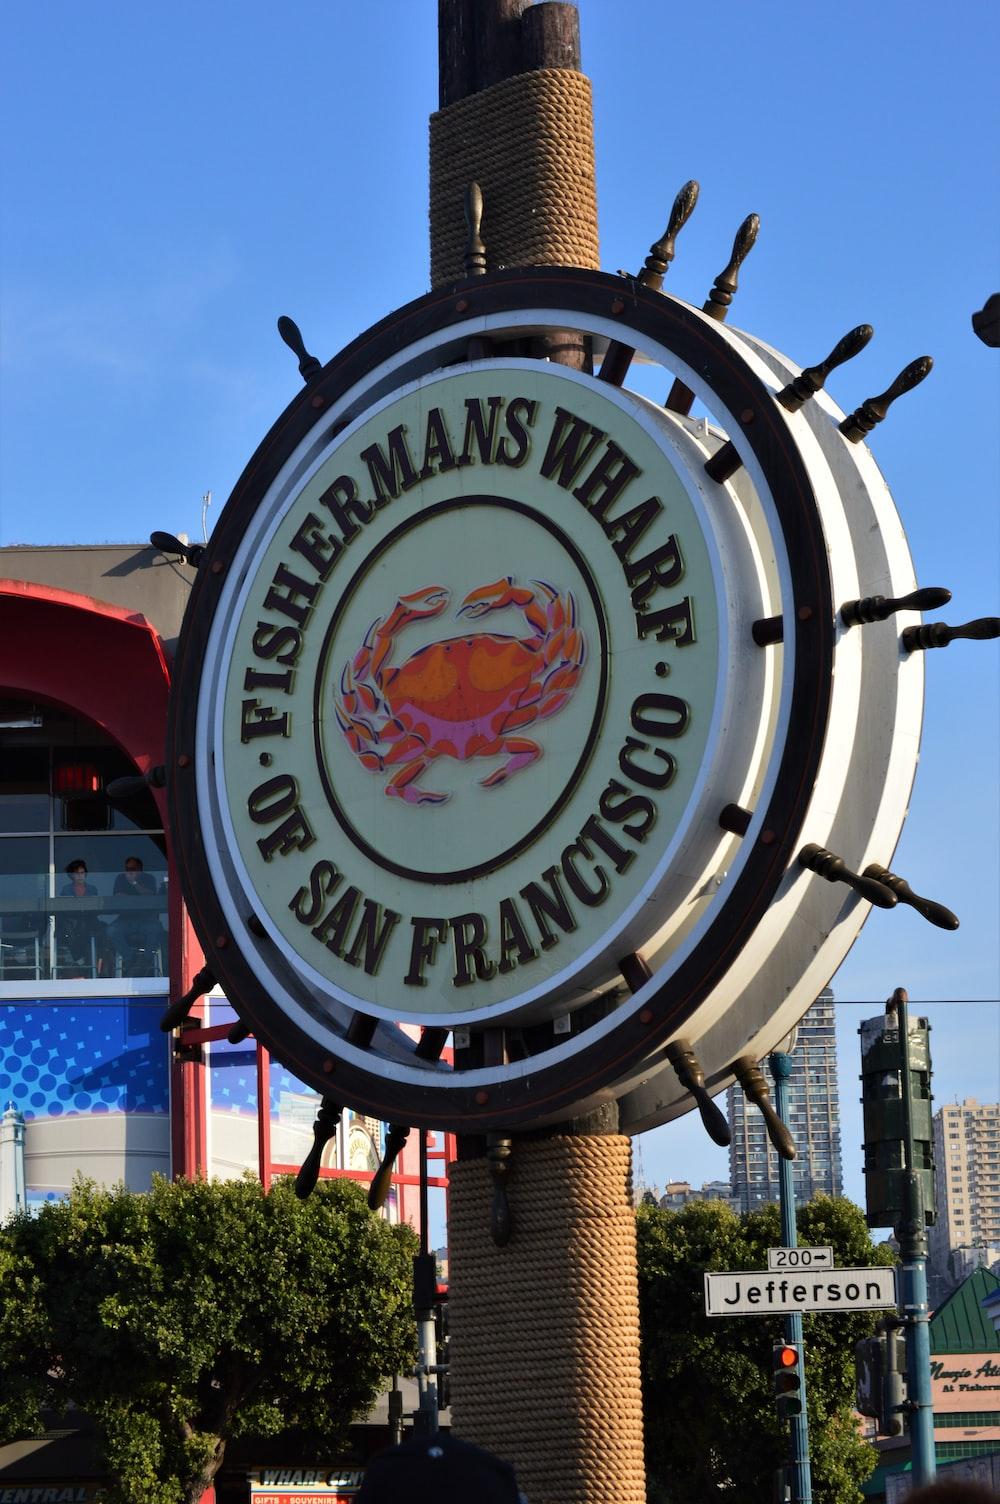 Fisherman's Wharf signage